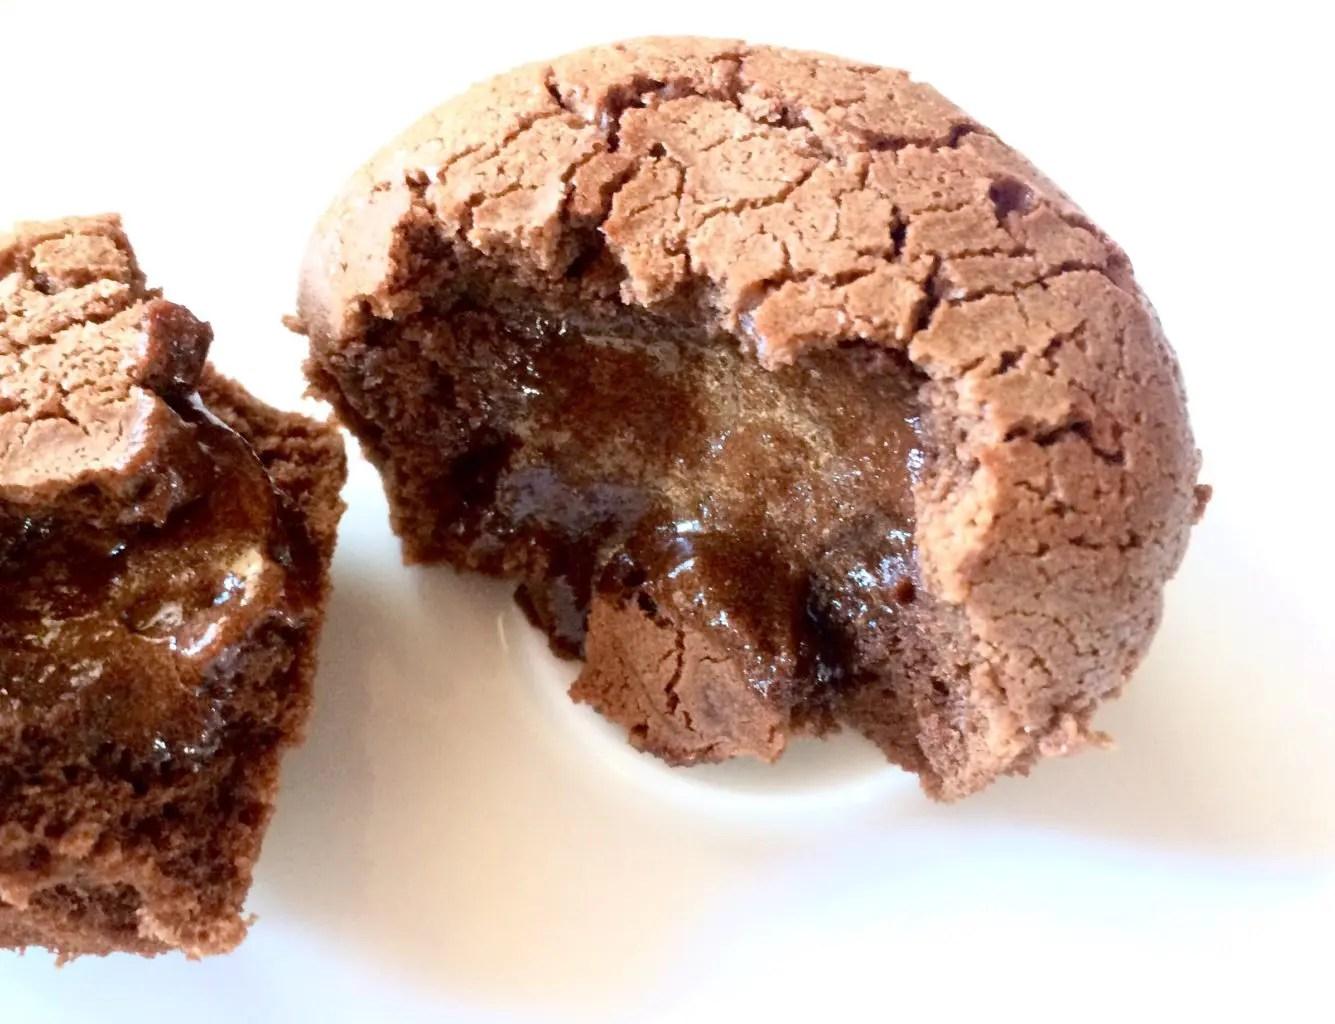 Glutenfri og laktosefri sjokoladefondant lavFODMAP